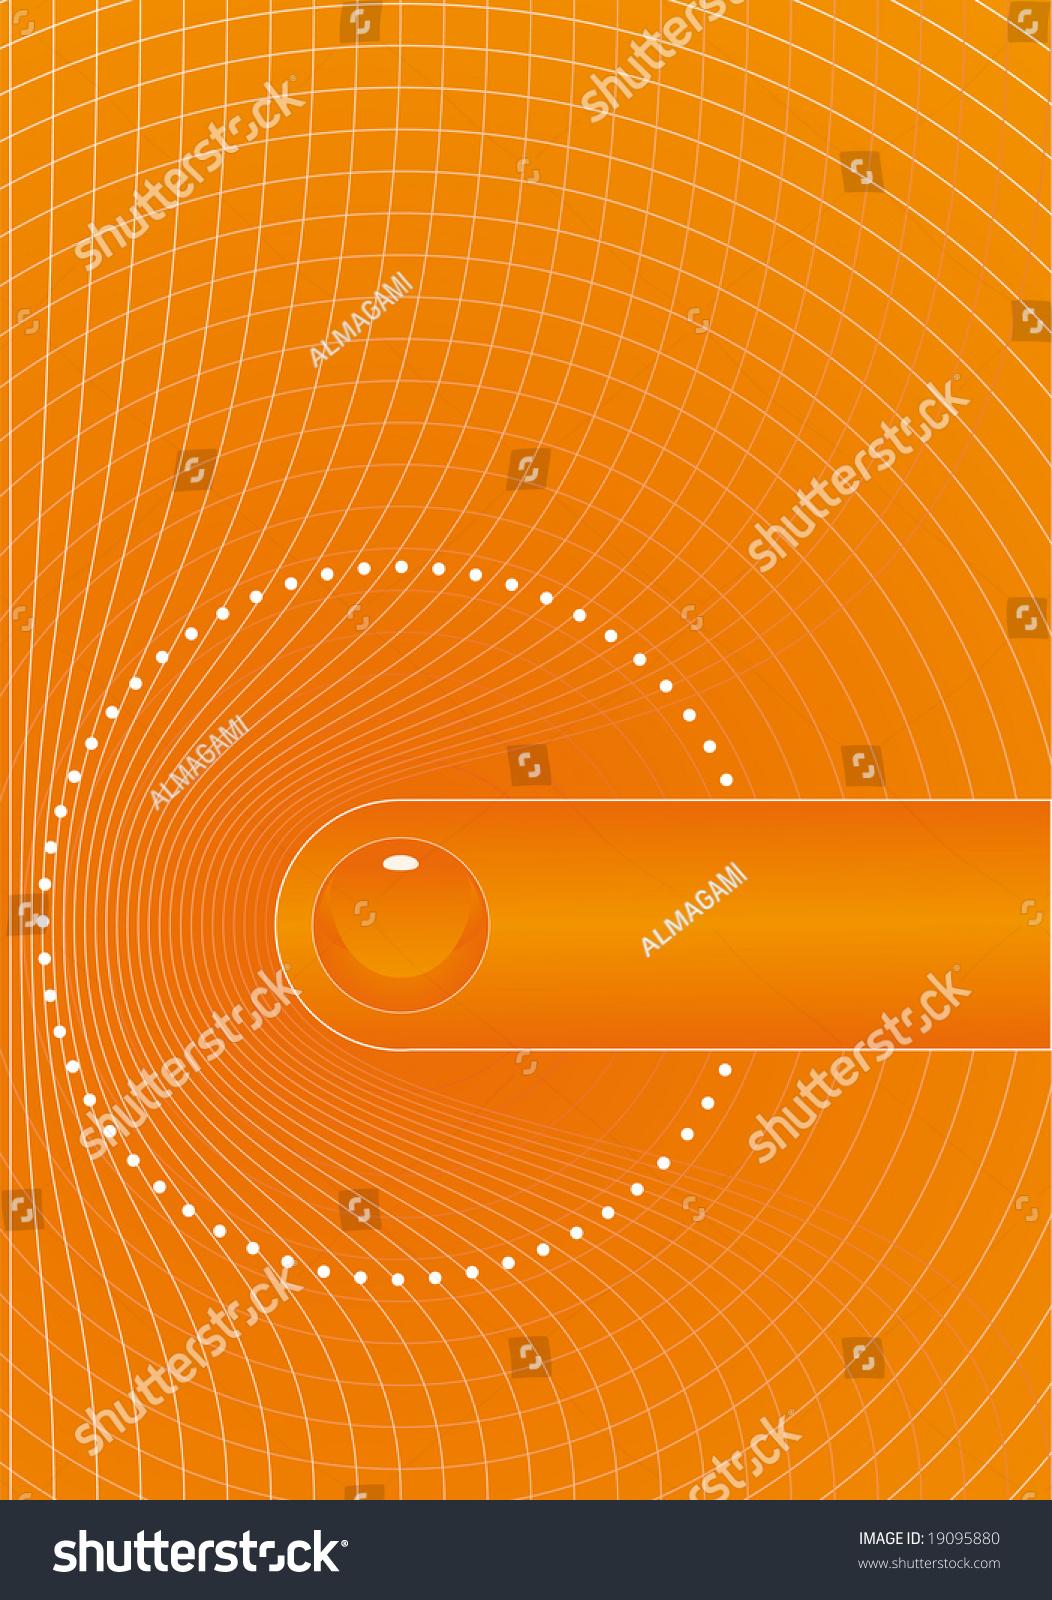 orange title page design vector portfolio stock illustration orange title page design vector in portfolio